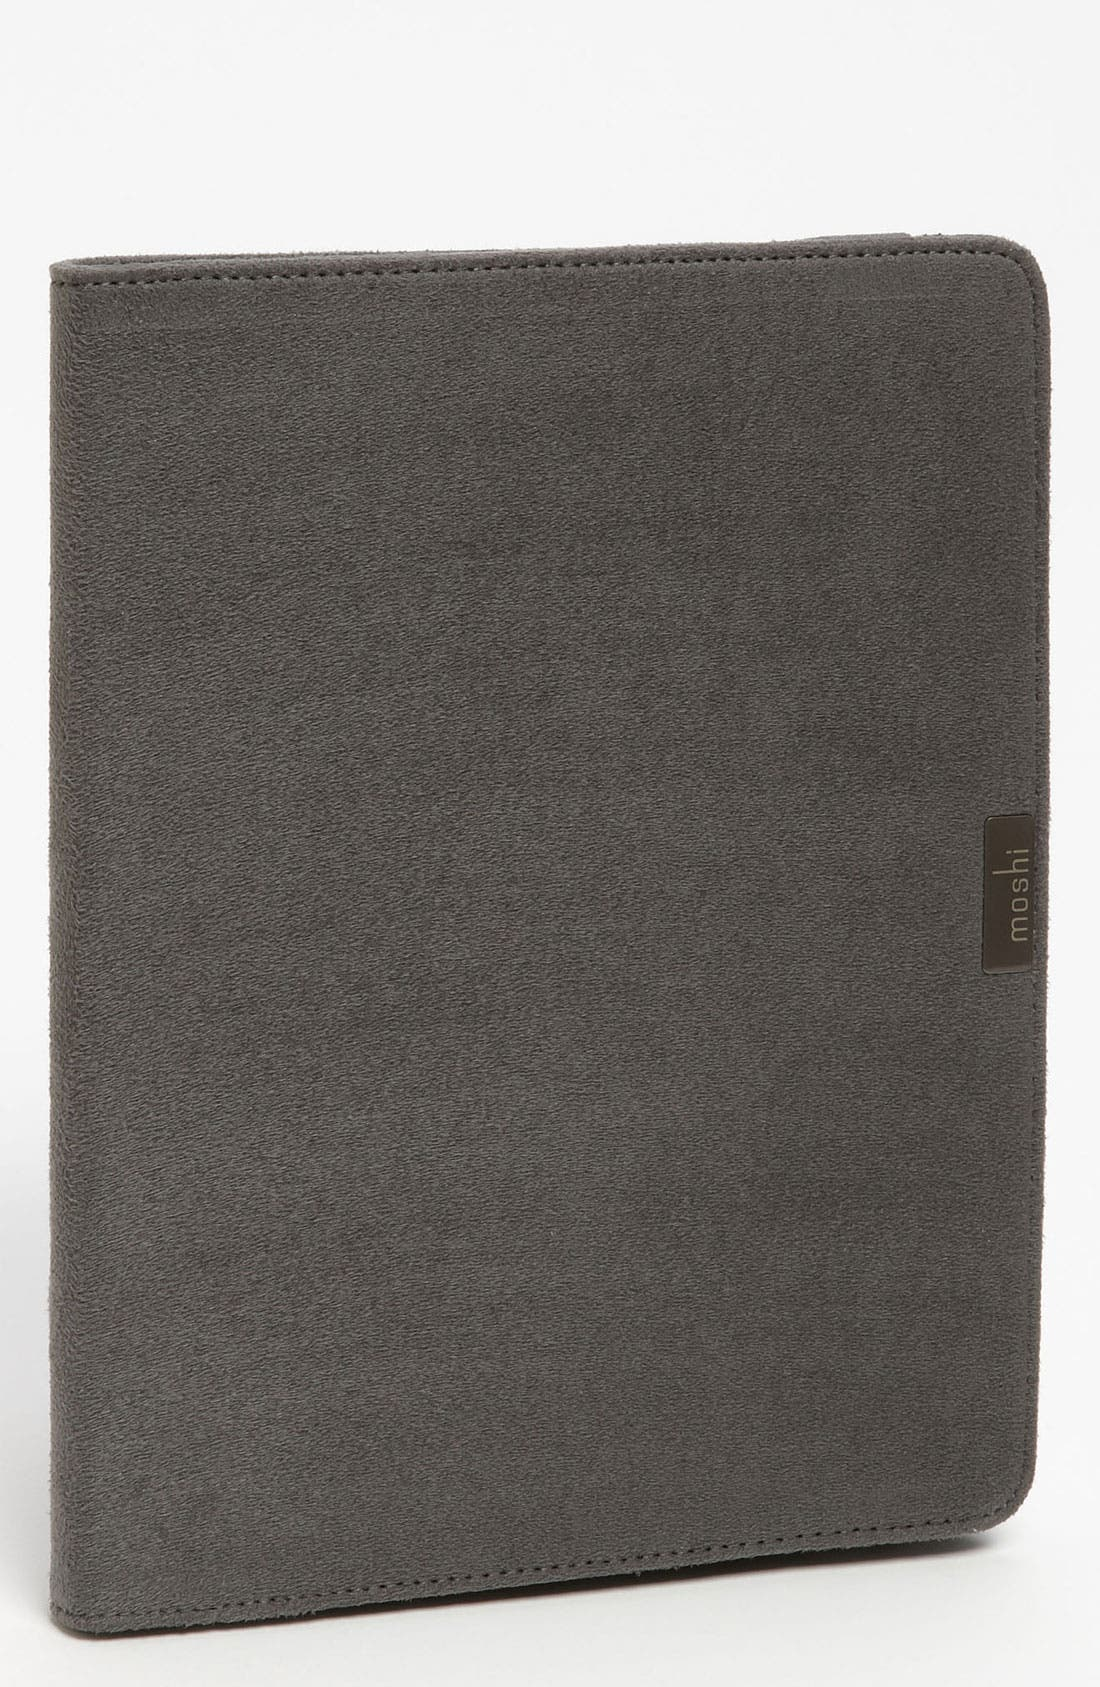 Alternate Image 1 Selected - Moshi 'Concerti' iPad 2 Portfolio Case